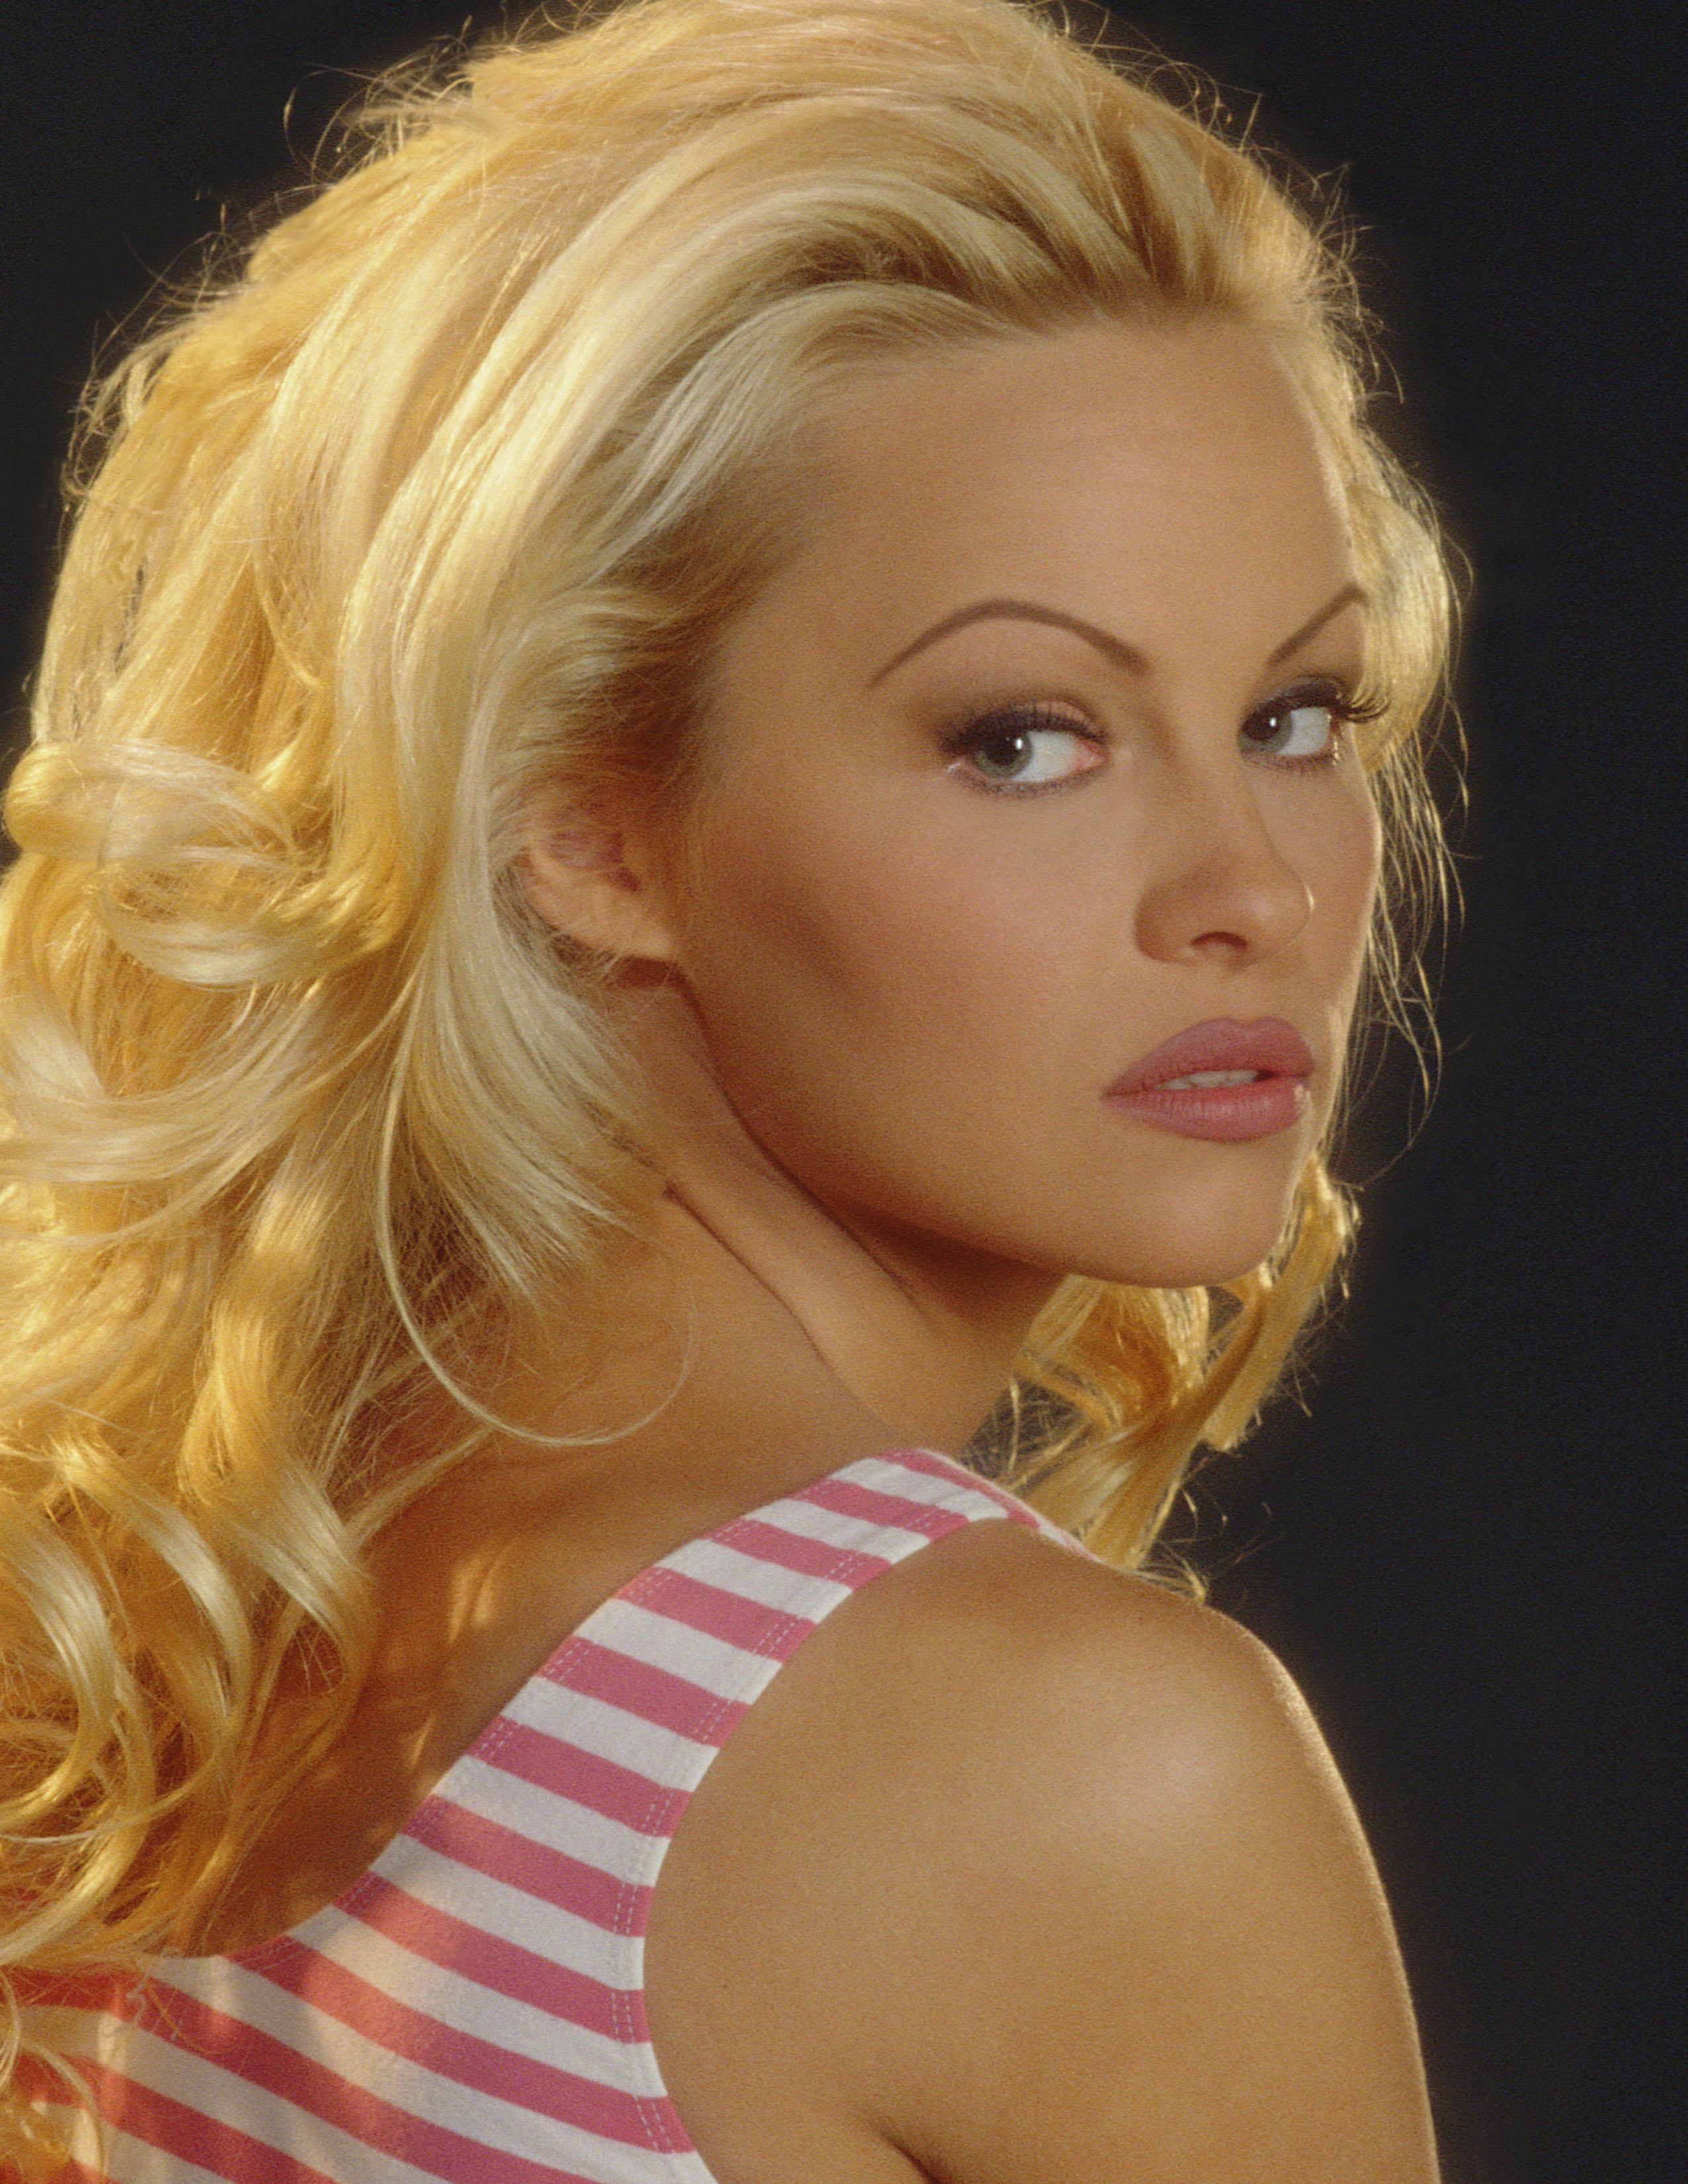 Pamela Anderson Photo 1009 Of 1200 Pics Wallpaper Photo 851063